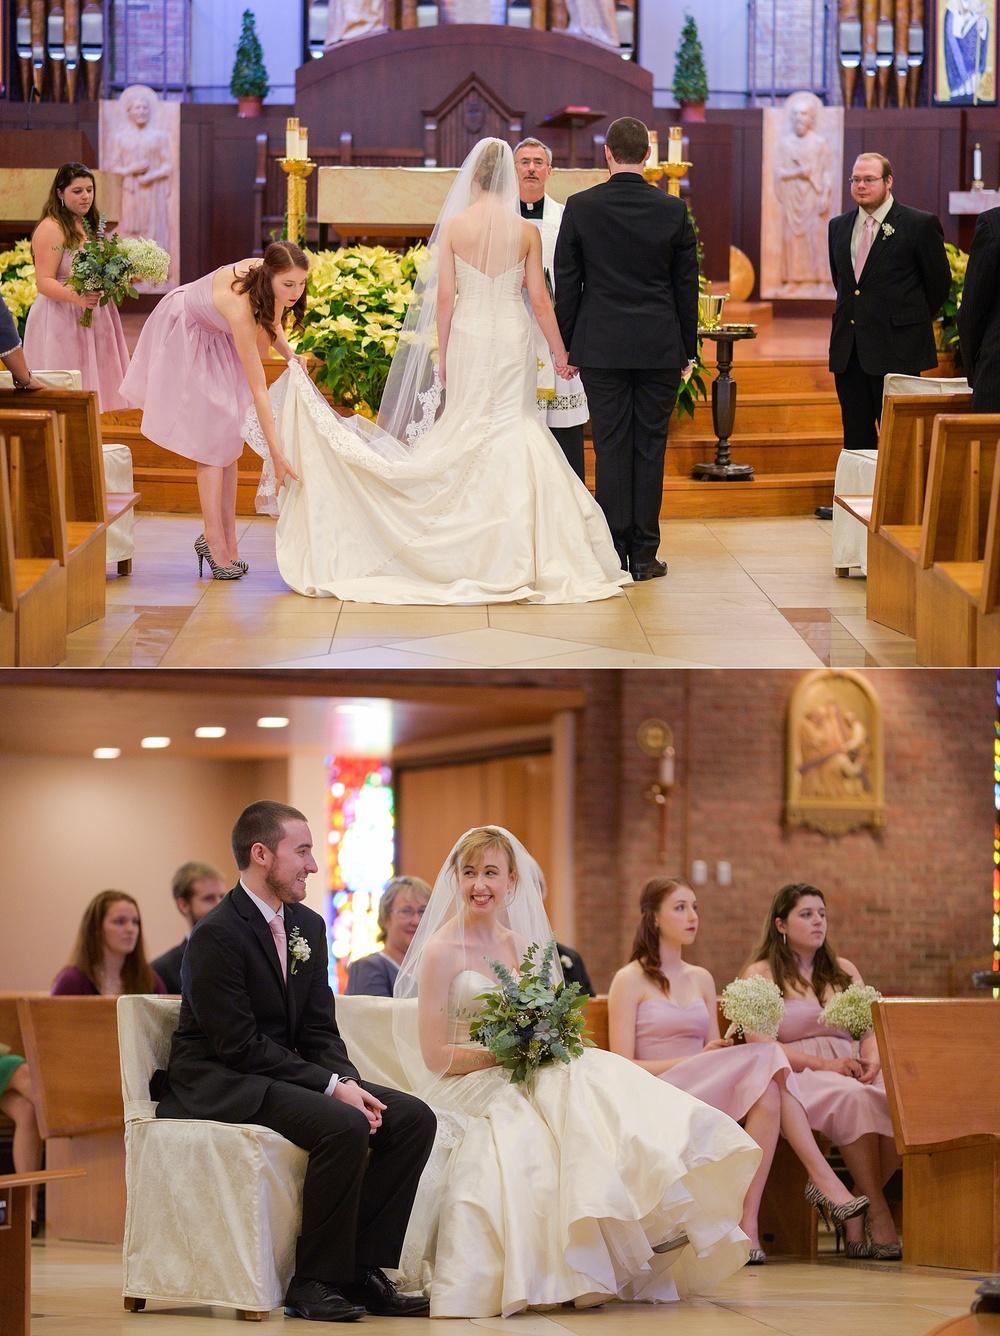 fredericksburg-wedding-church-mercantile_0019.jpg